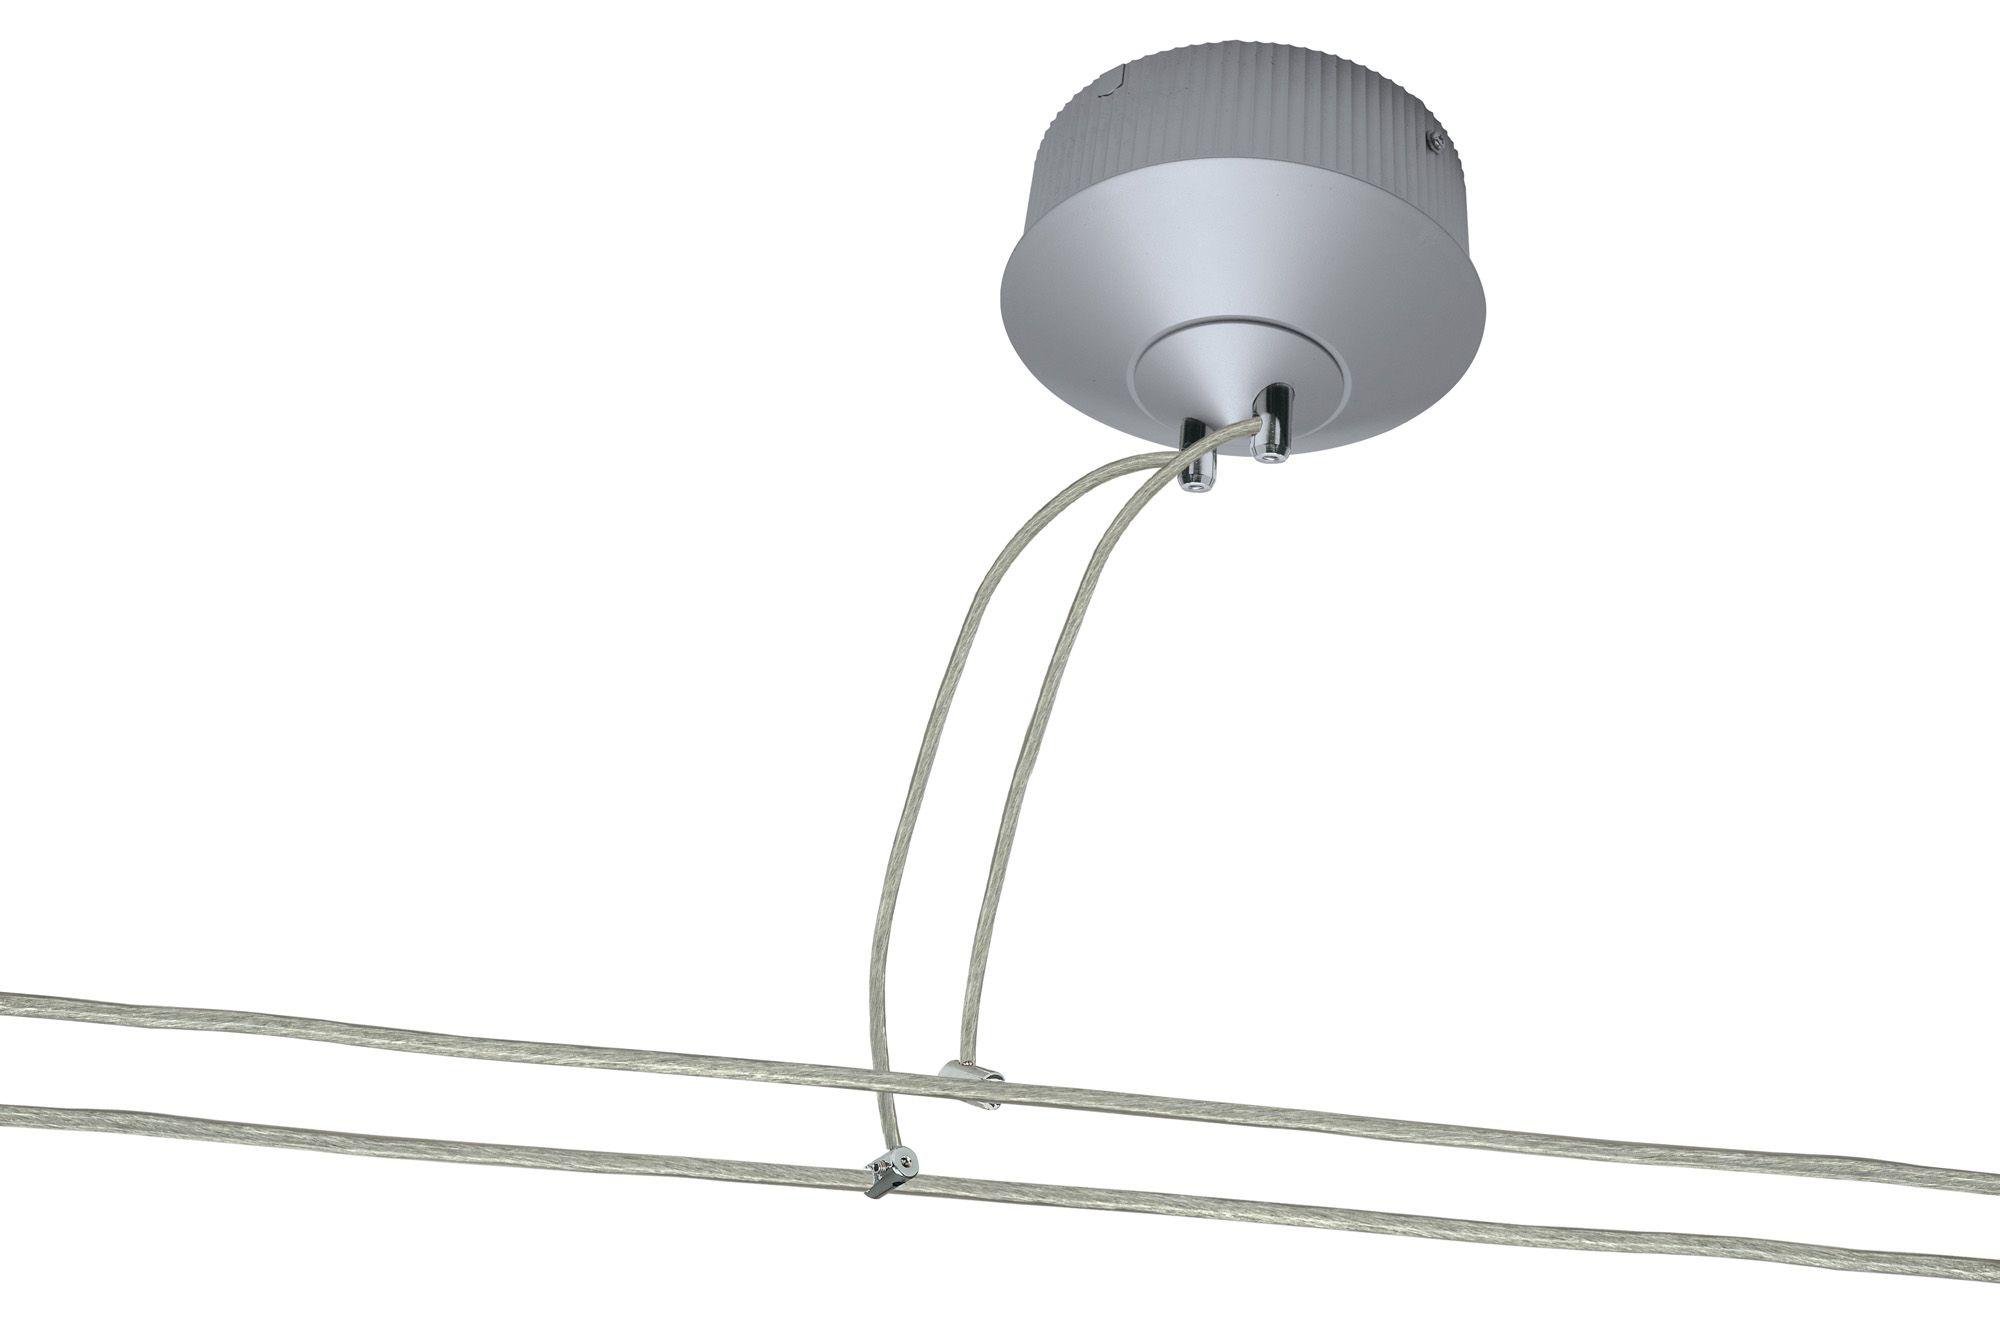 Superb  Schienen Seilsysteme Paulmann Paulmann Beleuchtungs Zubeh r Grau Metall